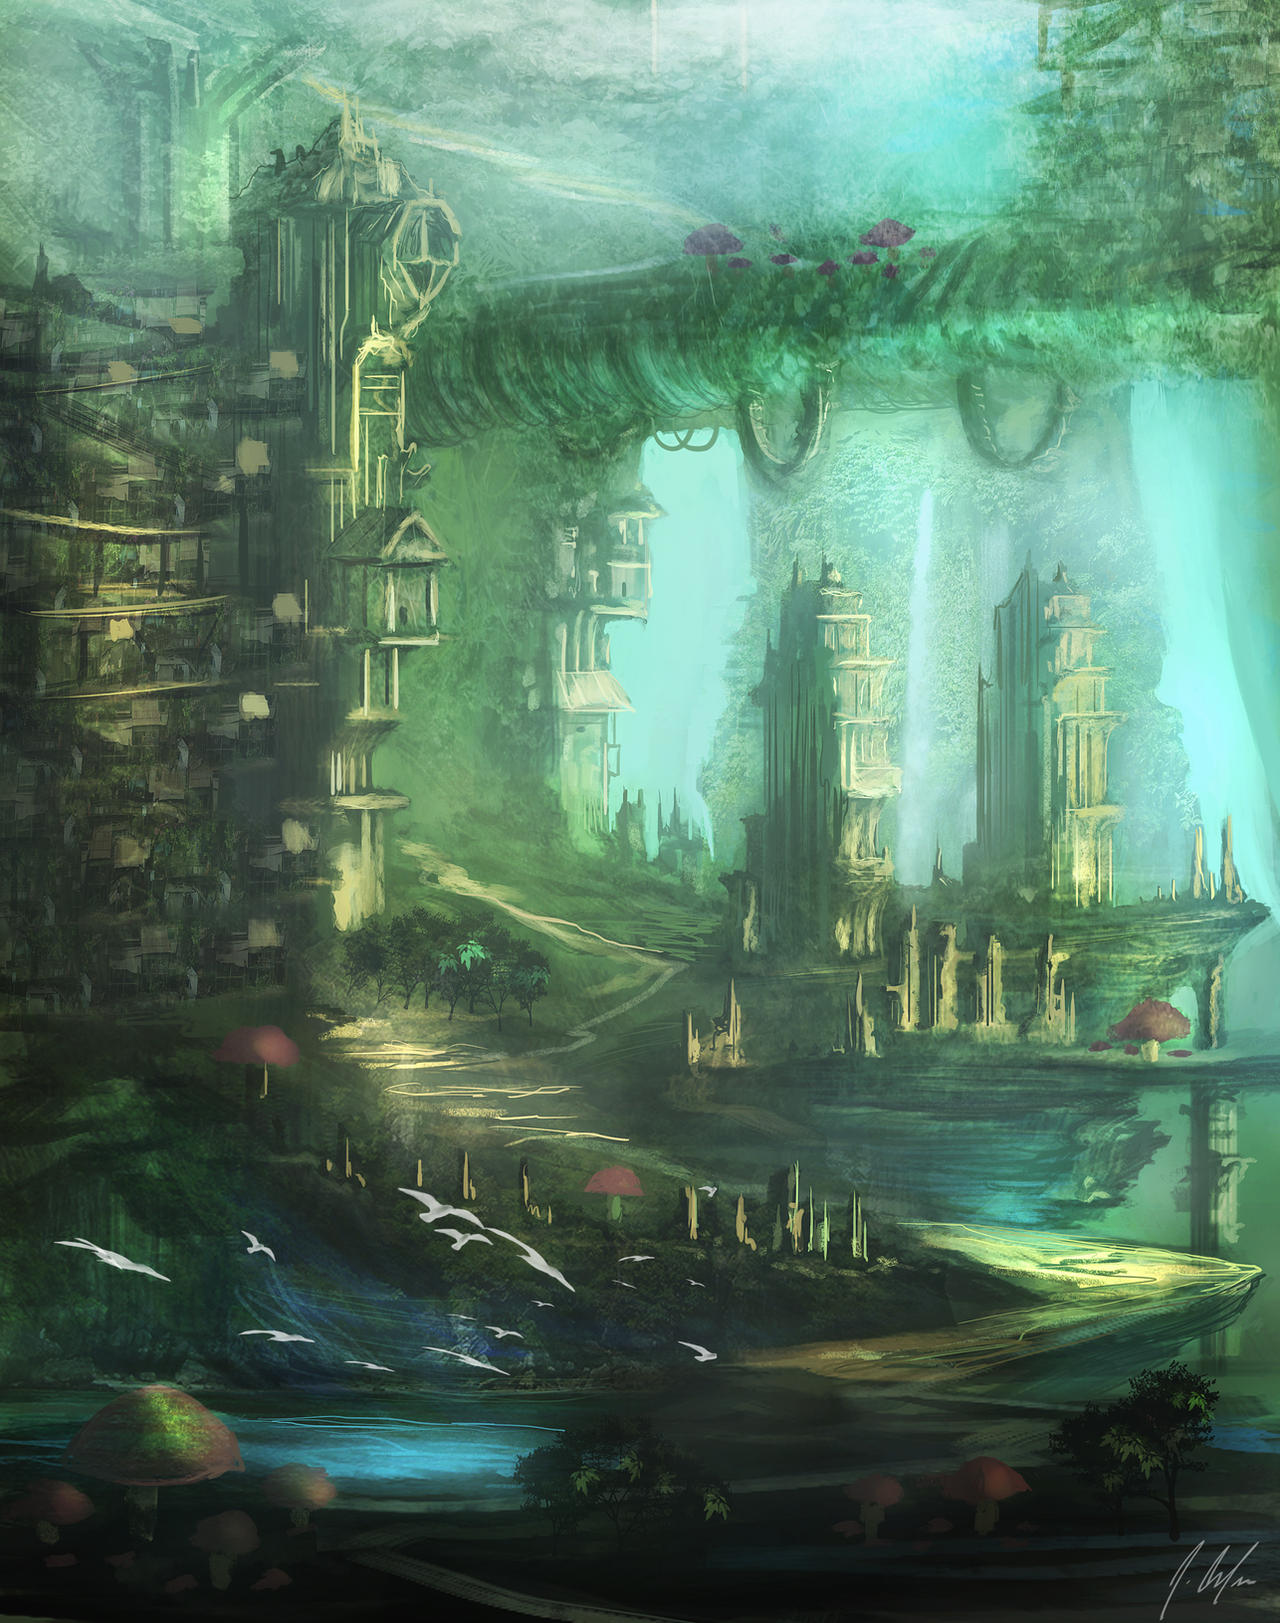 Mystic Landscape by JonathanDufresne